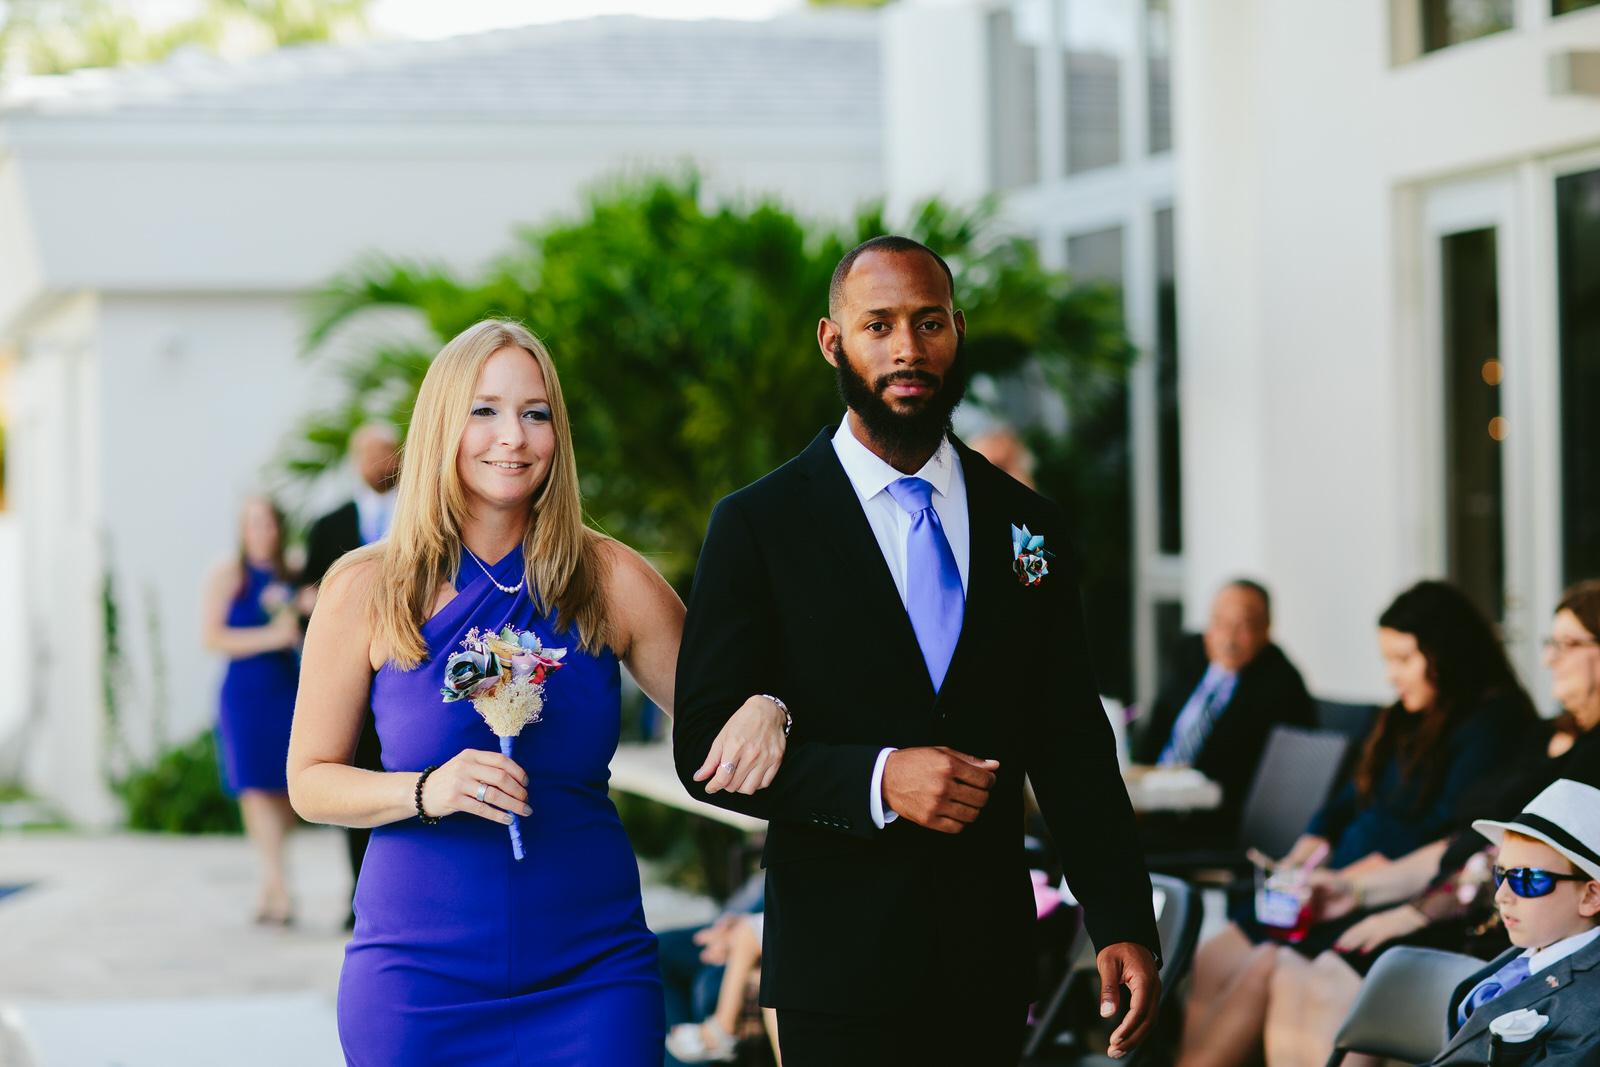 backyard-wedding-ceremony-moments-florida.jpg